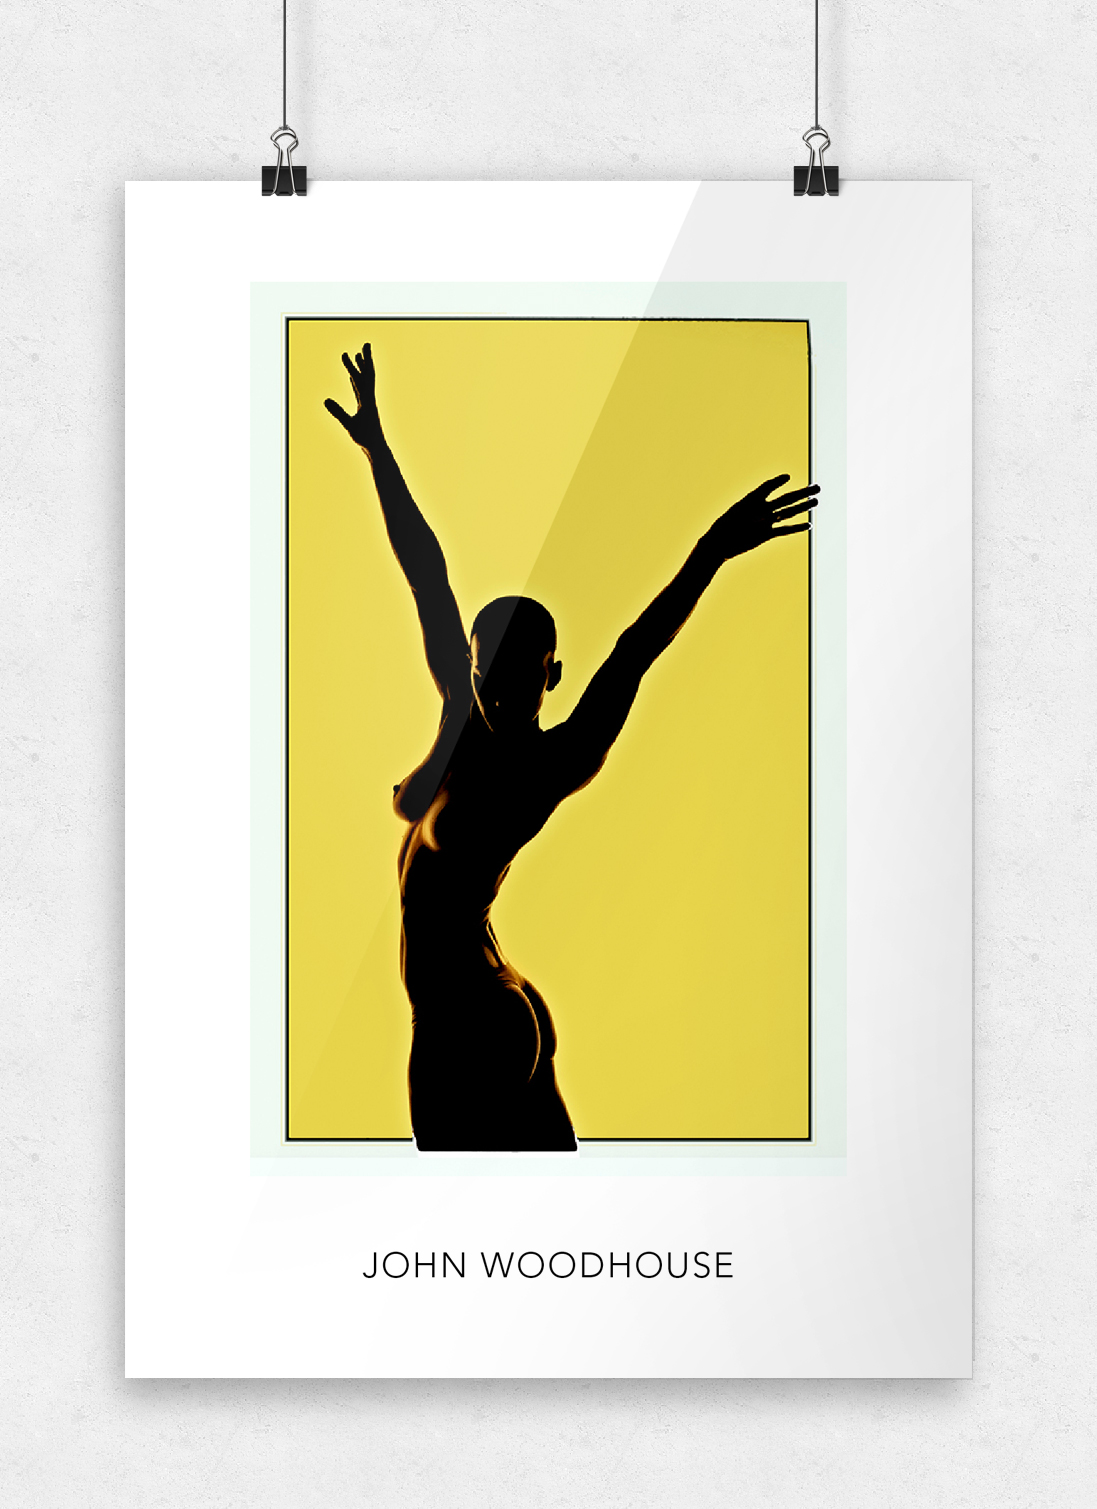 JW-Posters-Template_18.jpg